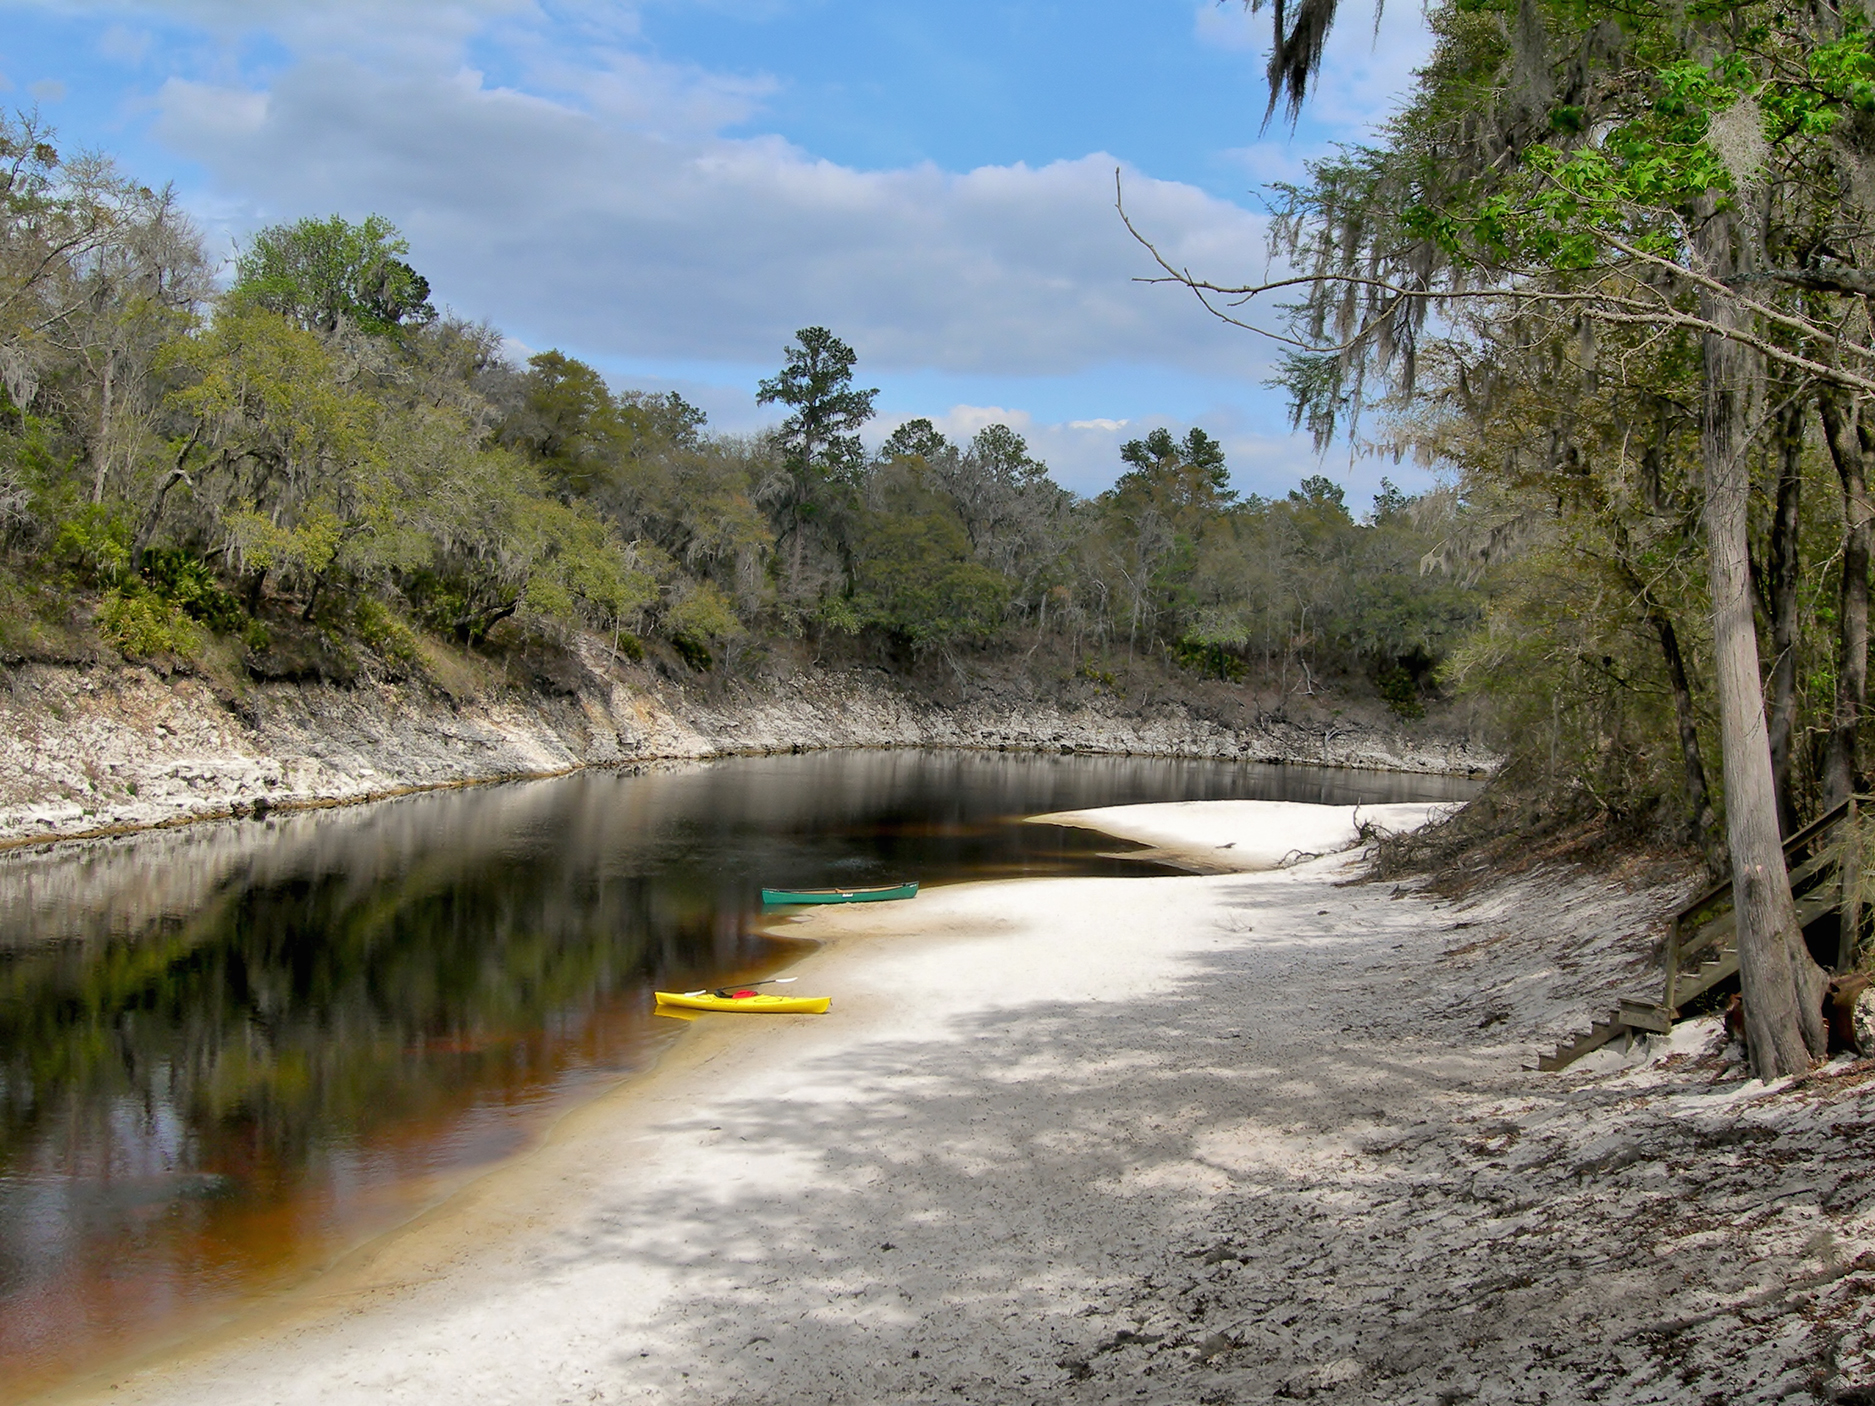 Best Tent Camping: Florida, Florida camping, fall camping